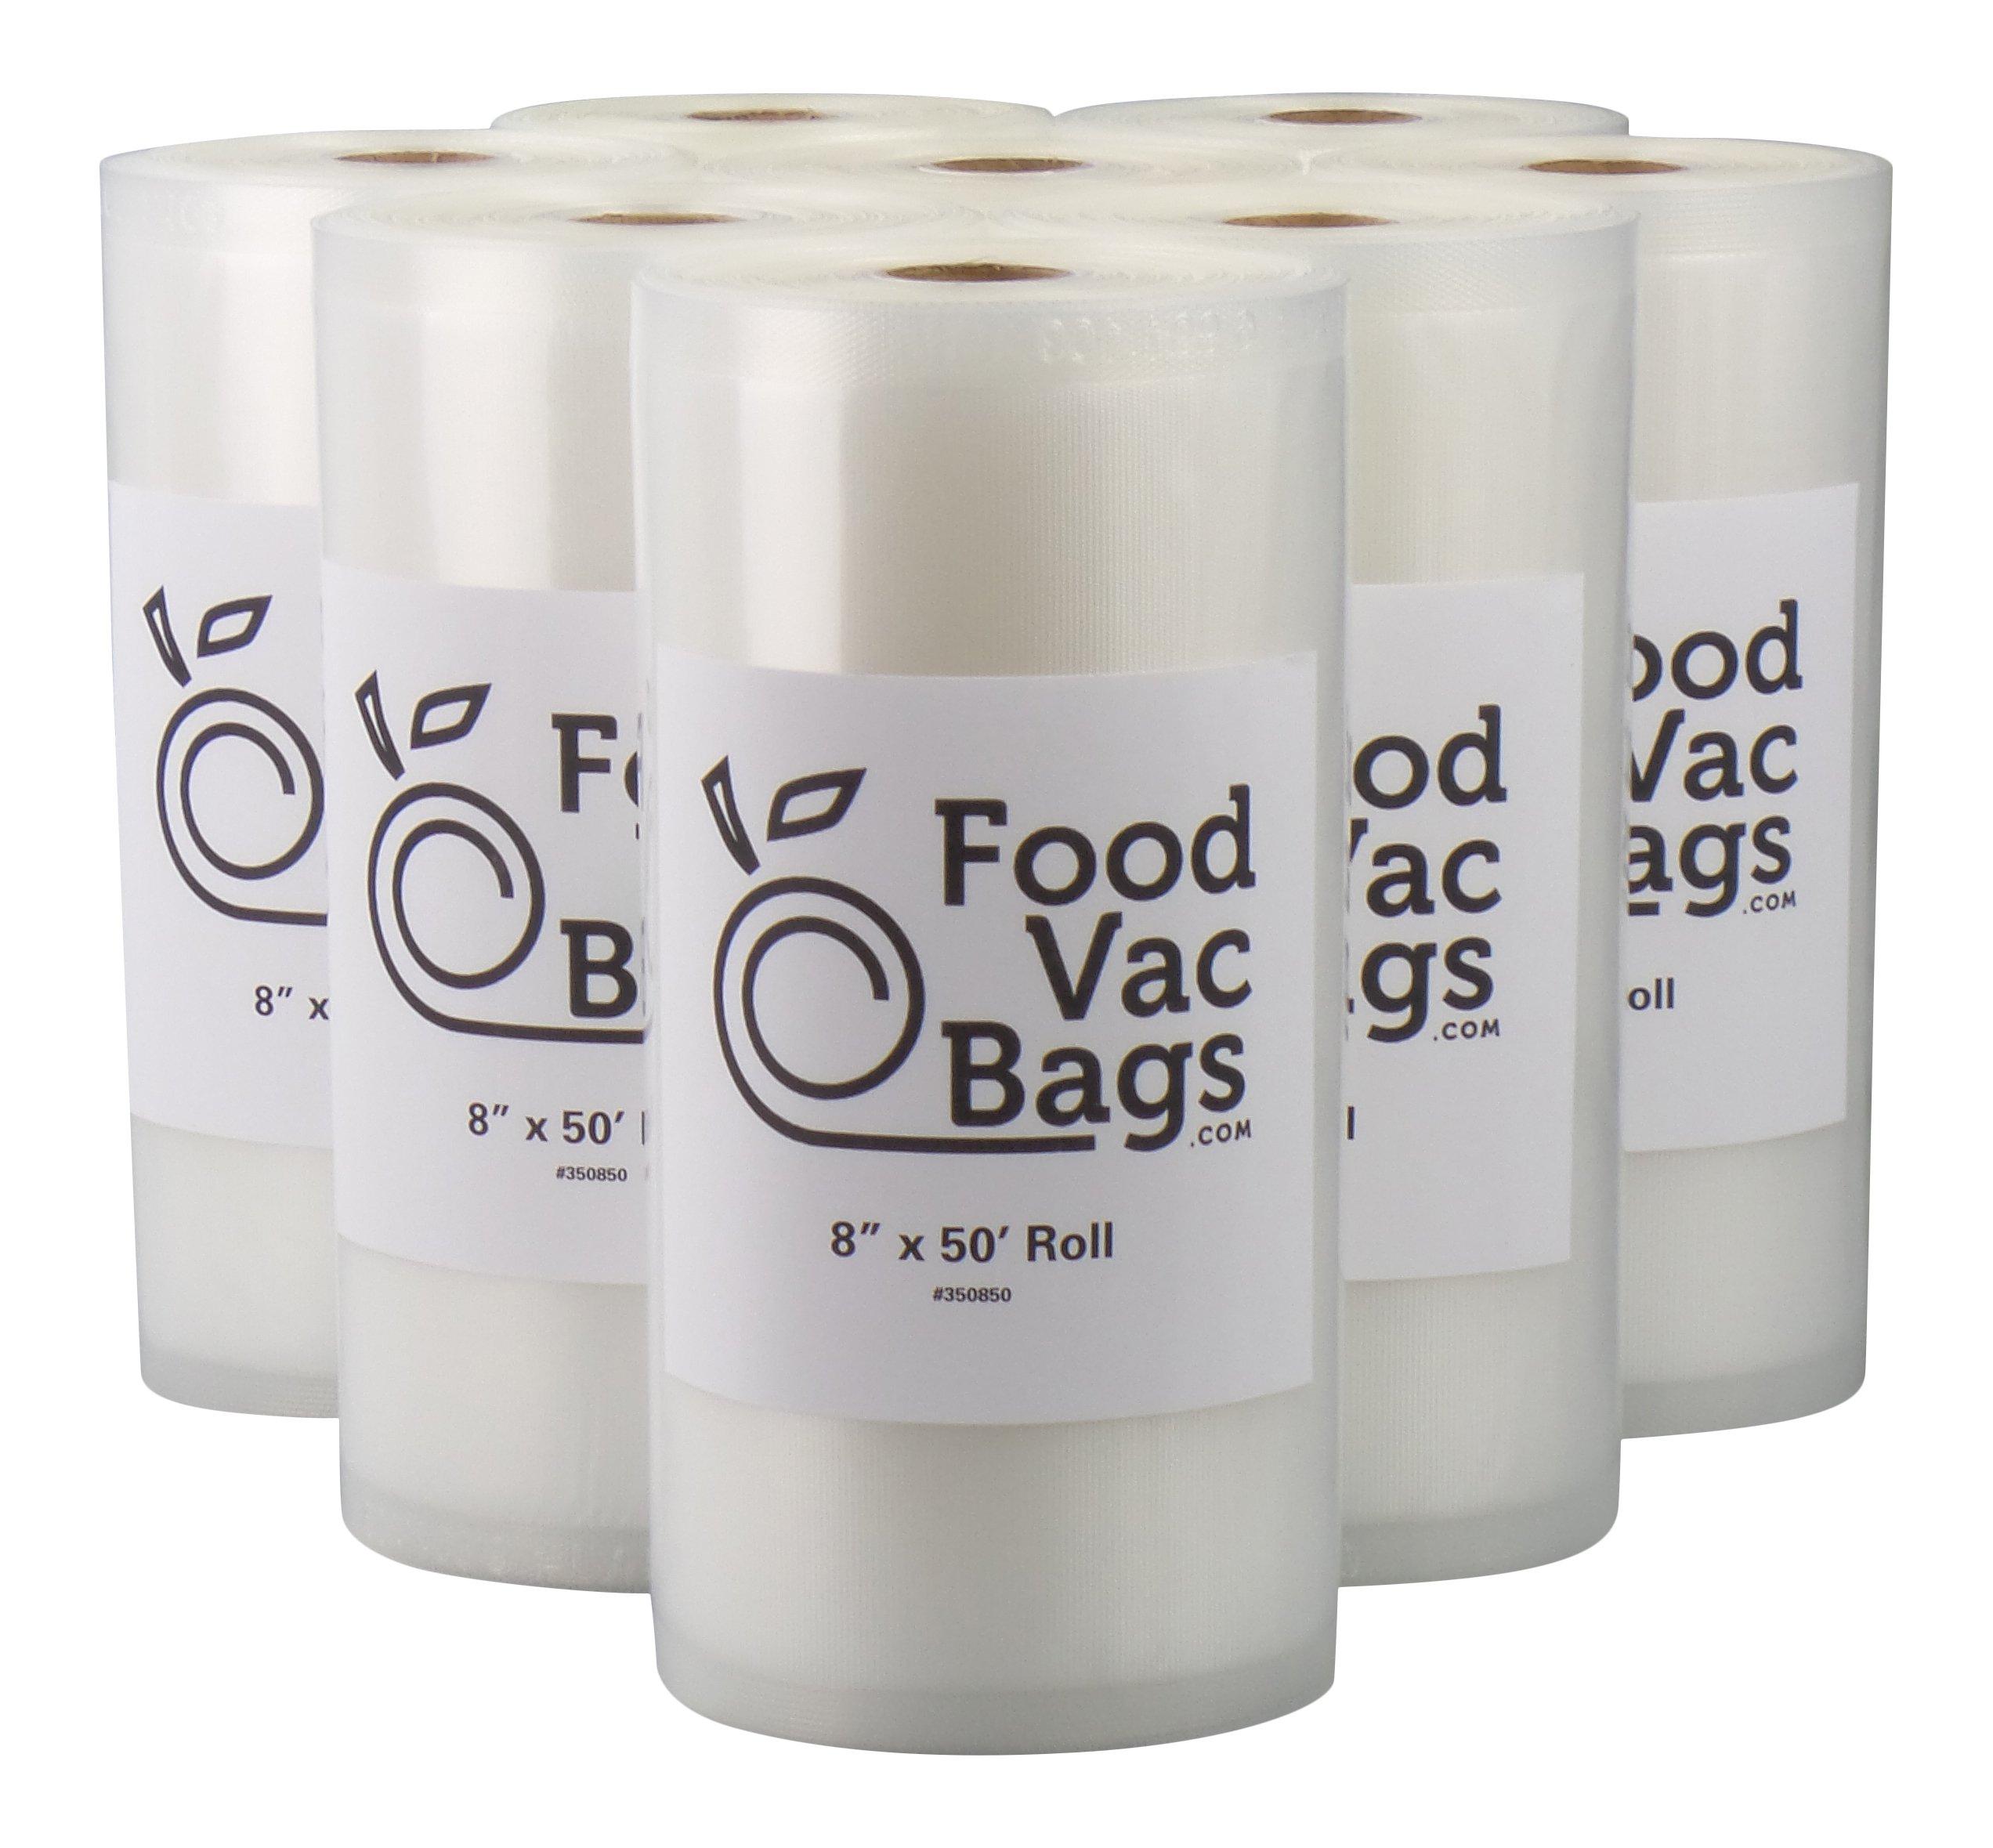 Eight 8X50 Rolls of 4 mil FoodVacBags Vacuum Sealer Bags